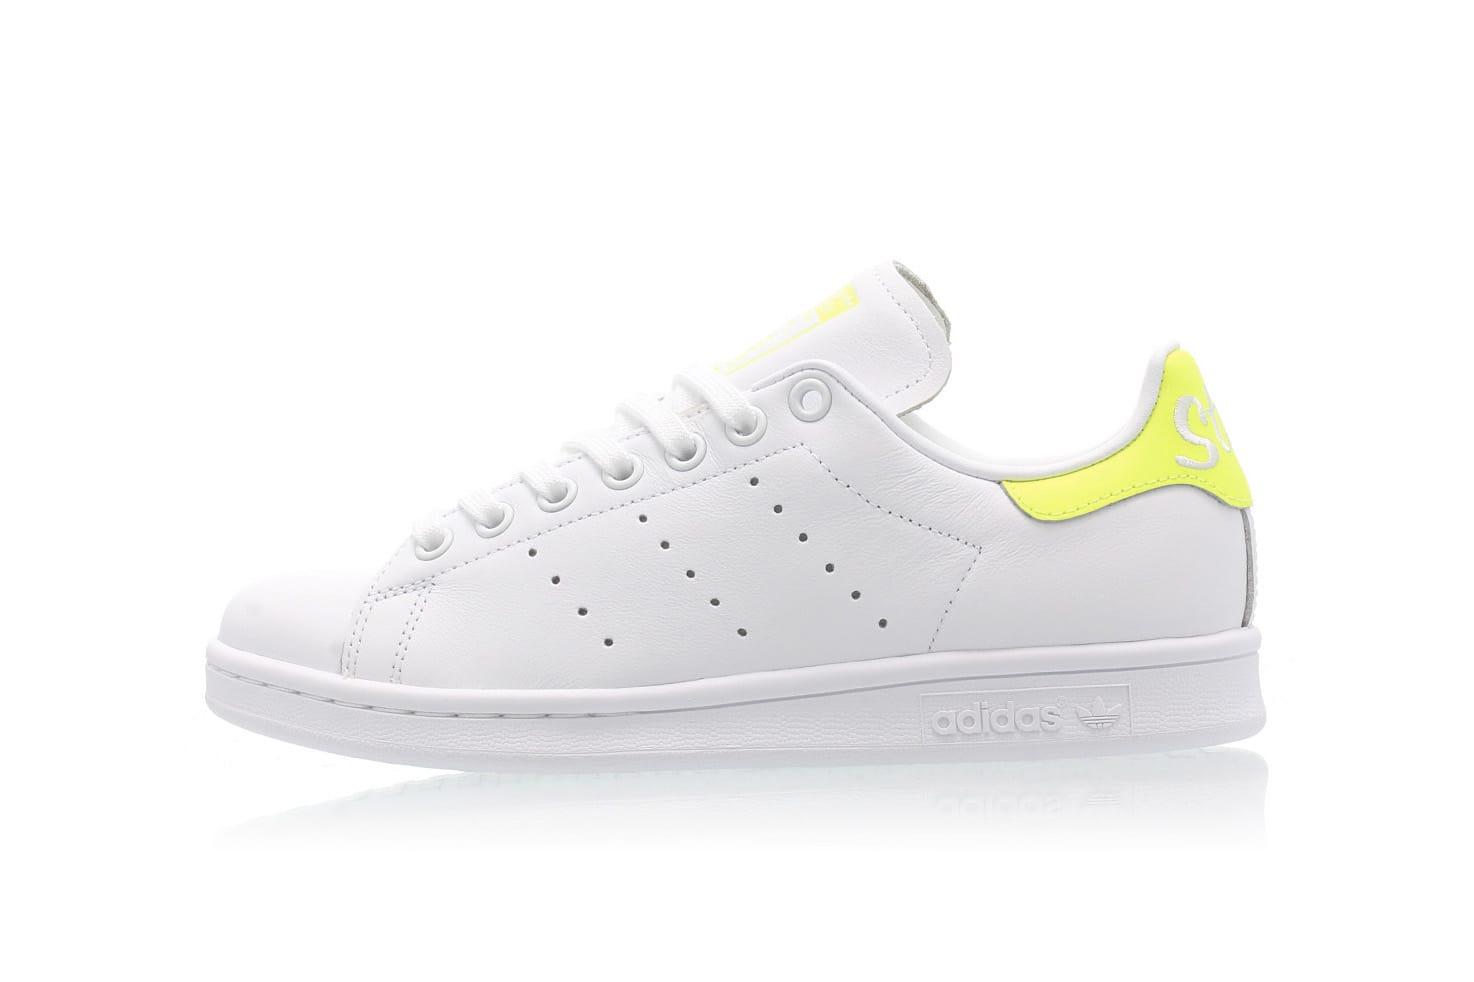 adidas Originals Stan Smith Neon Yellow